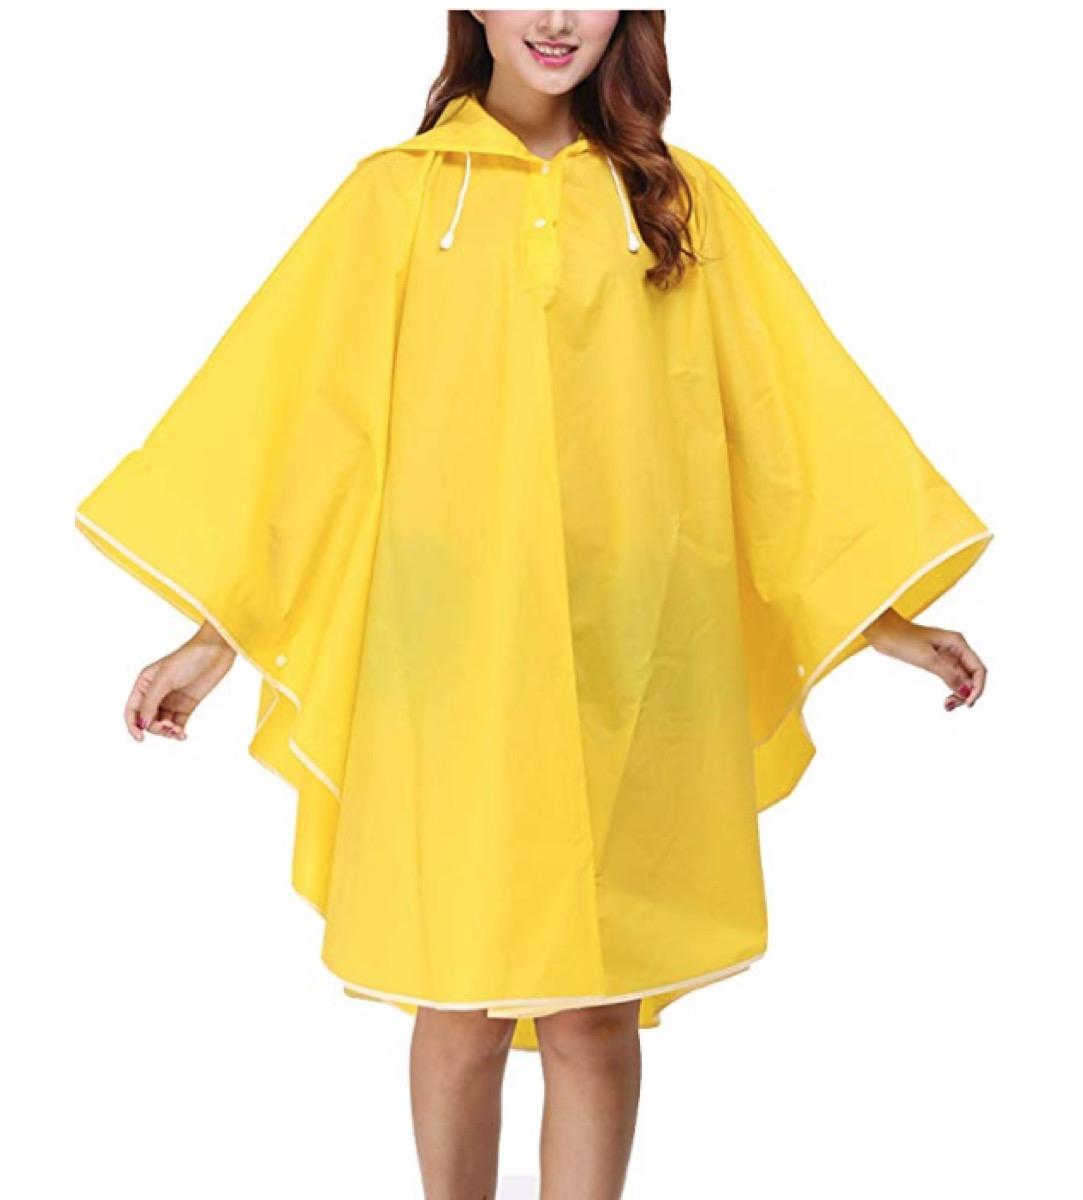 yellow rain poncho from doreyi